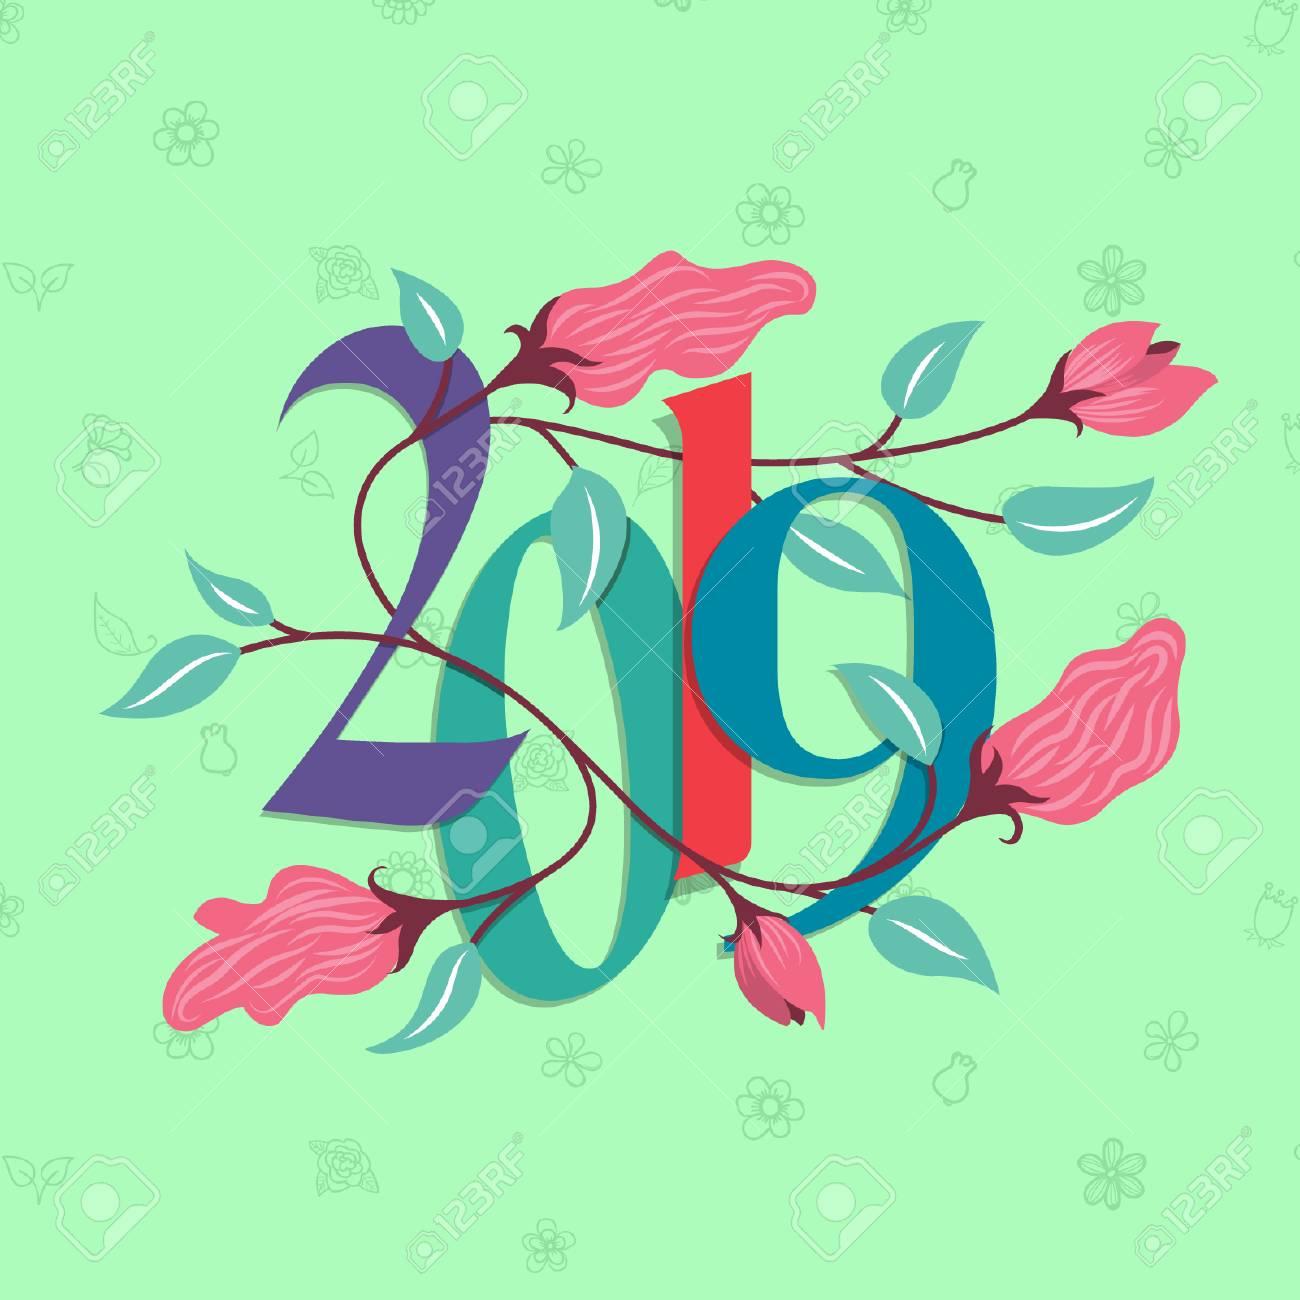 New Year 2019 - Vector Design - 110628689